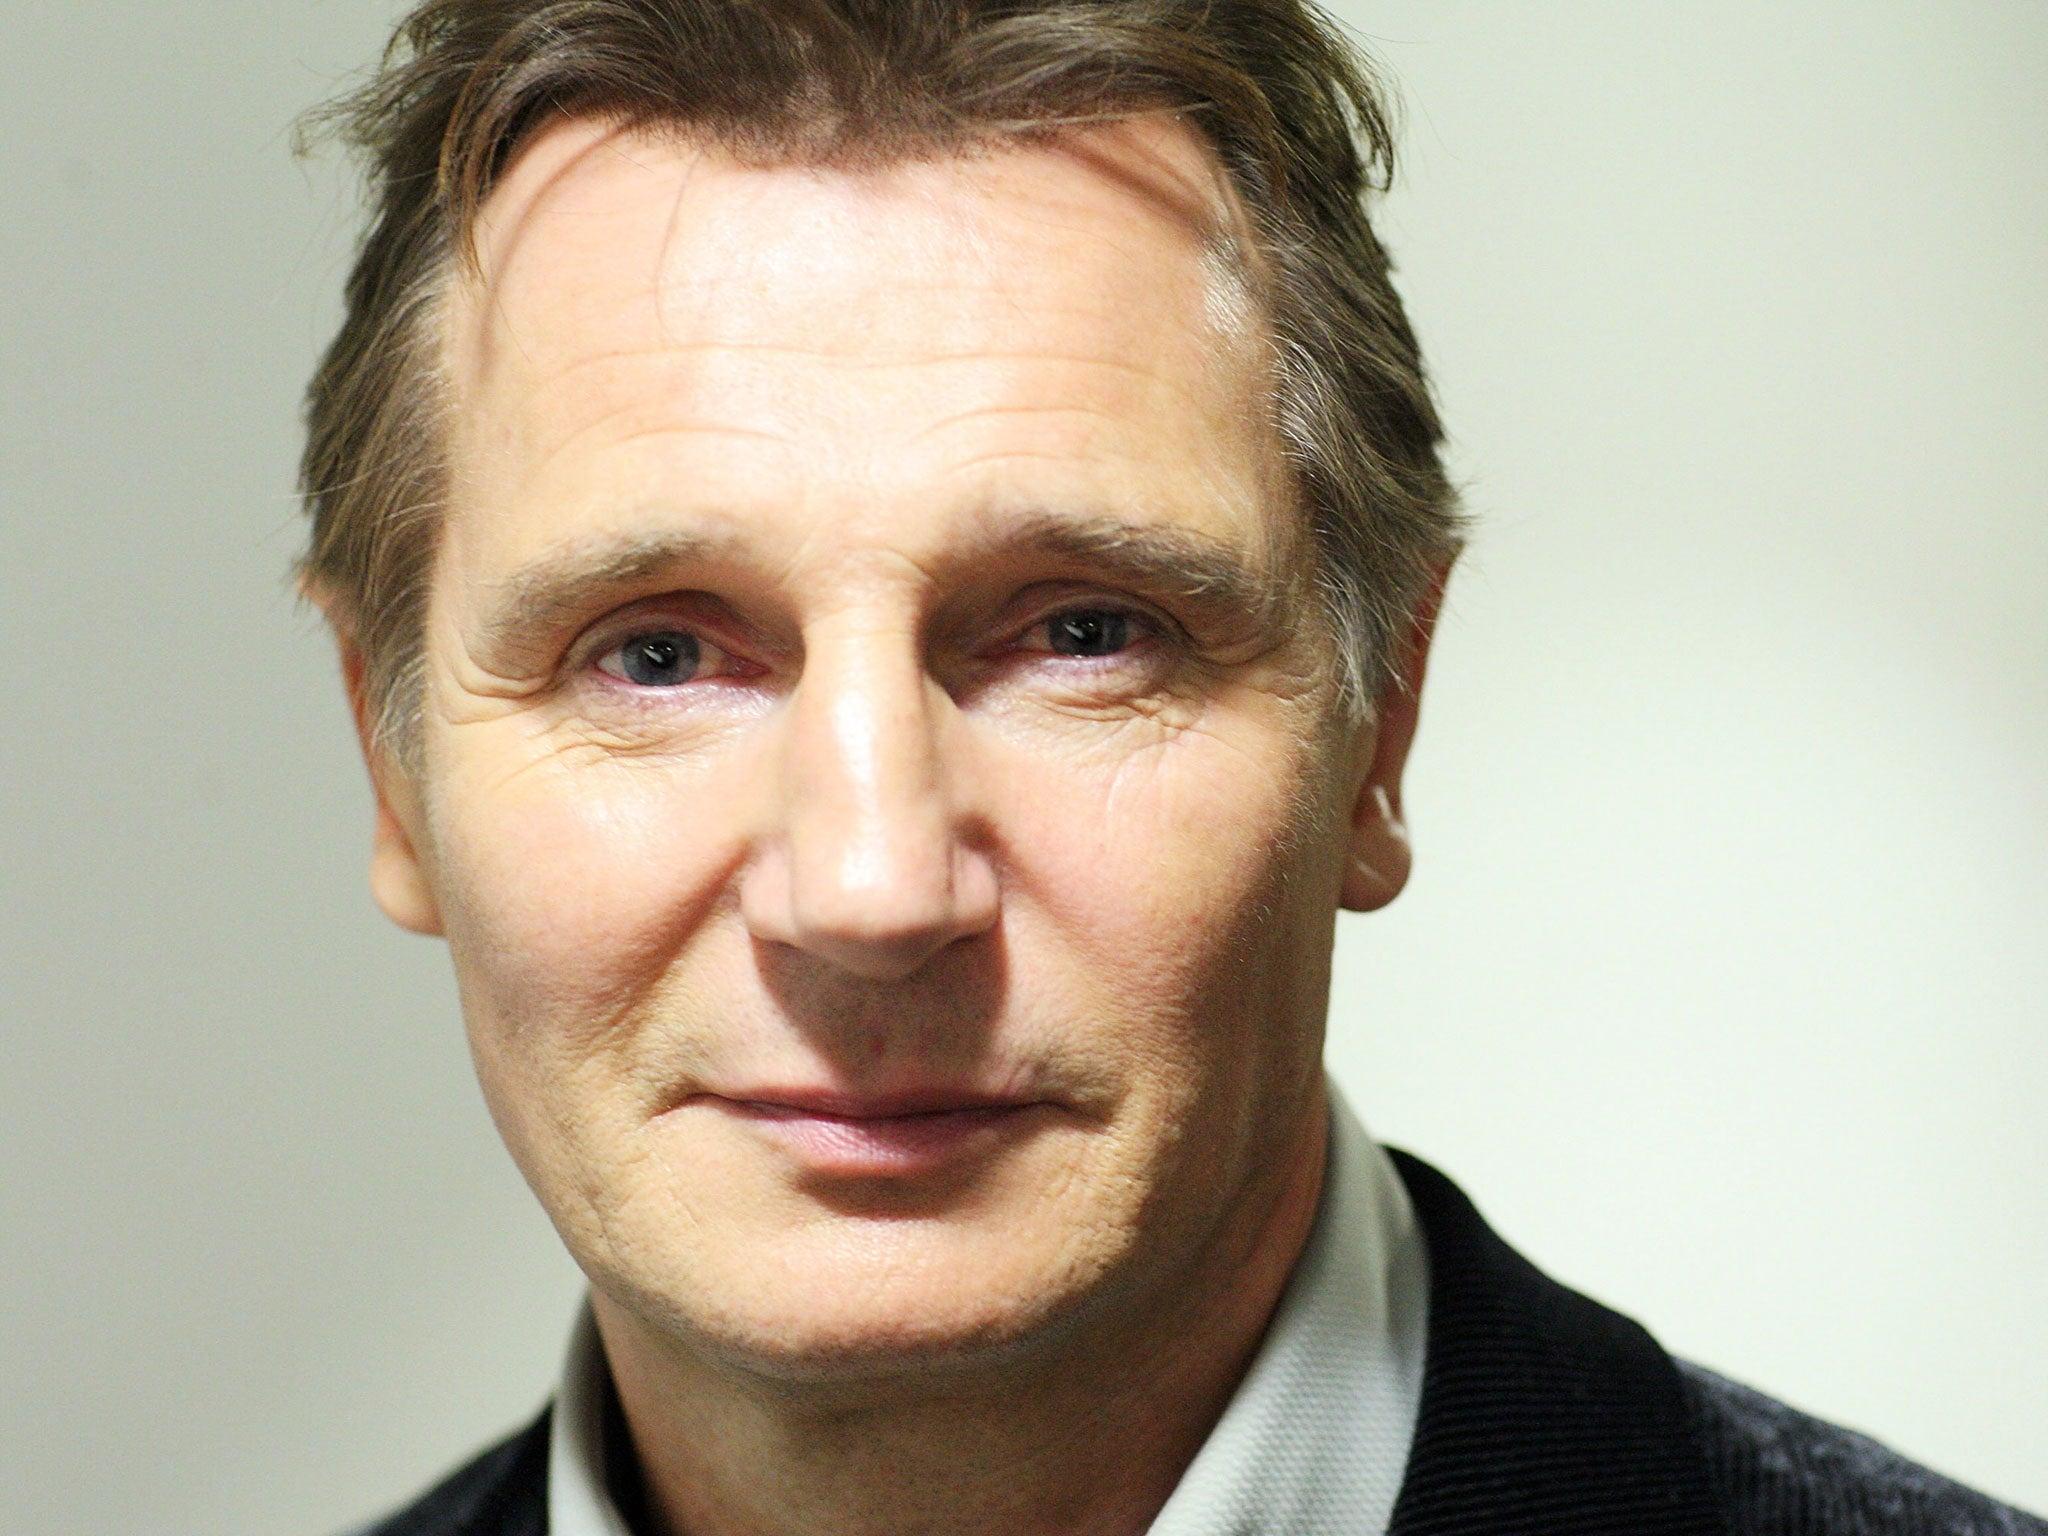 Liam Neeson Liam Neeson turned down James Bond role because late wife